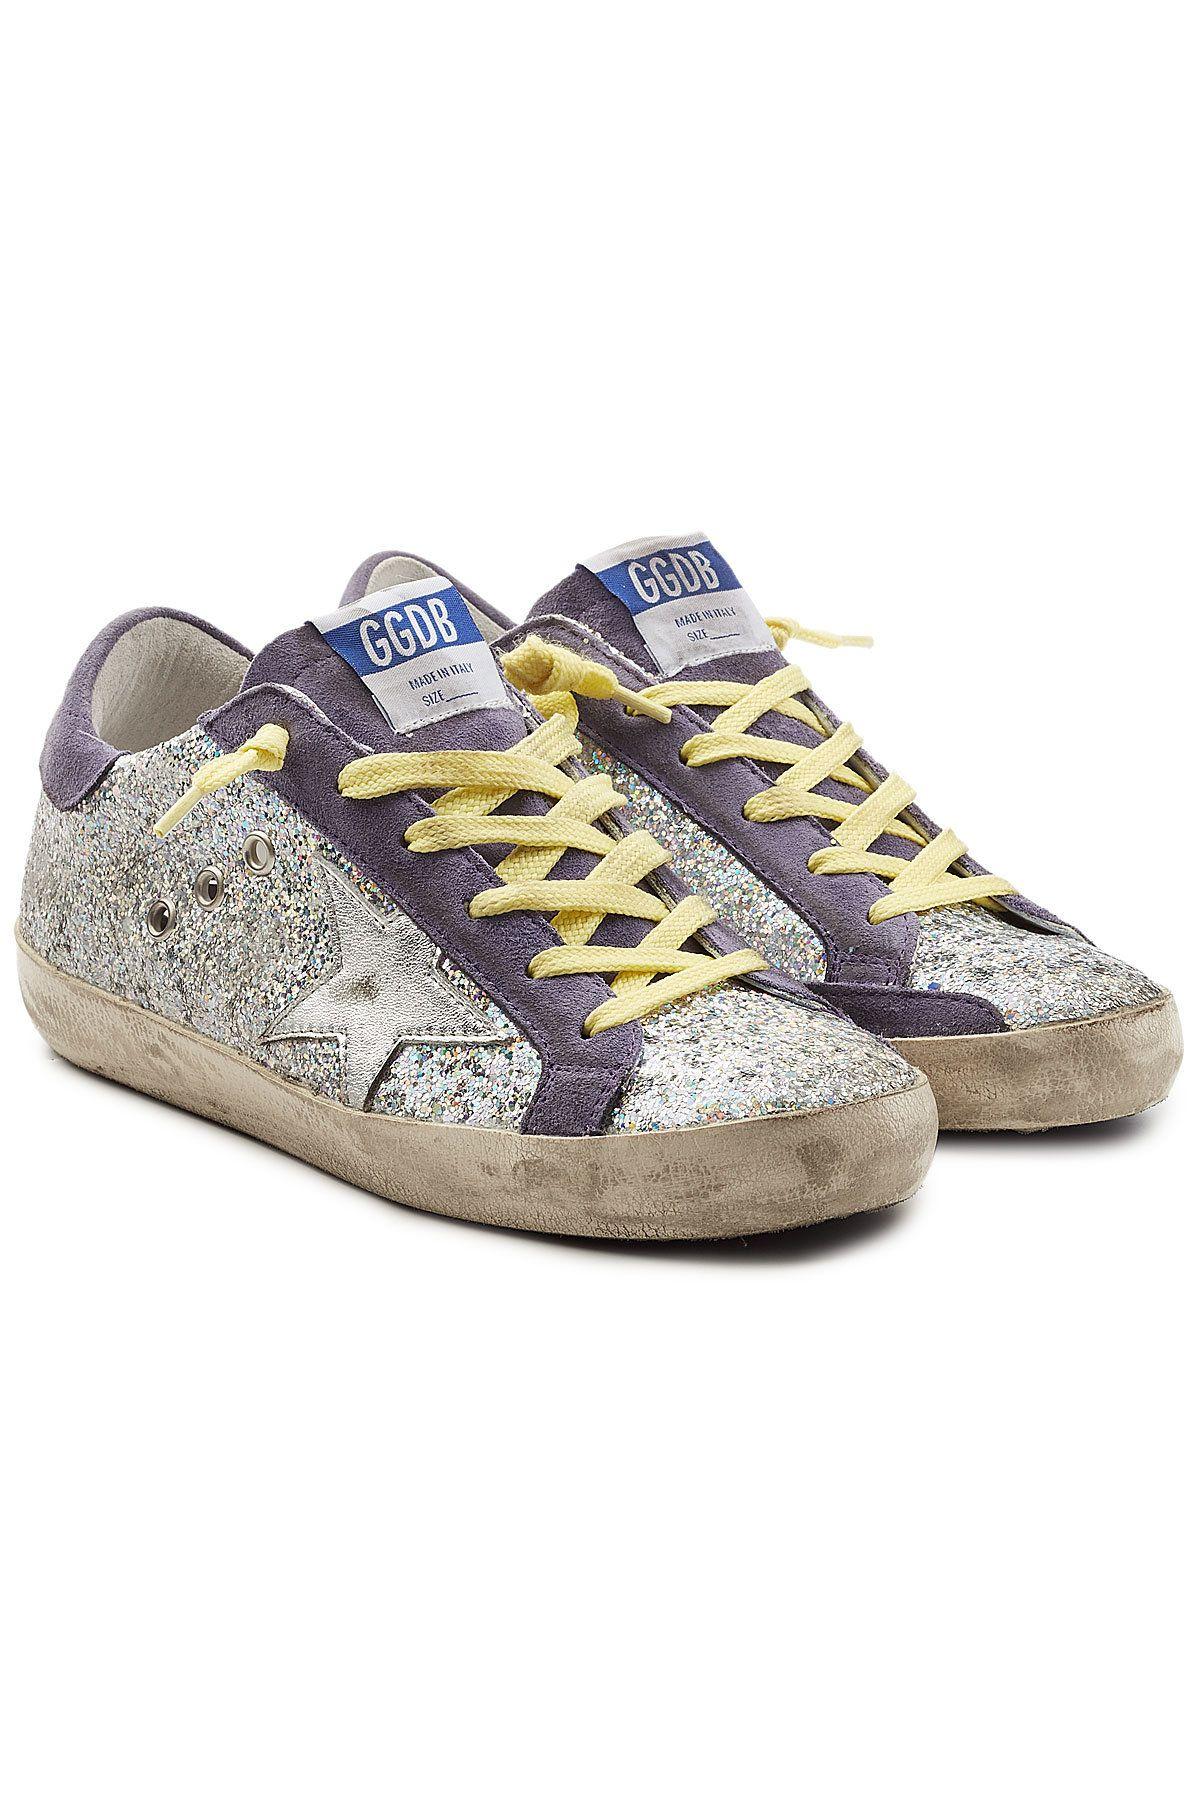 Golden Goose Super Star Glitter Sneakers With Suede In Purple Modesens Glitter Sneakers Golden Goose Sneakers Sneakers